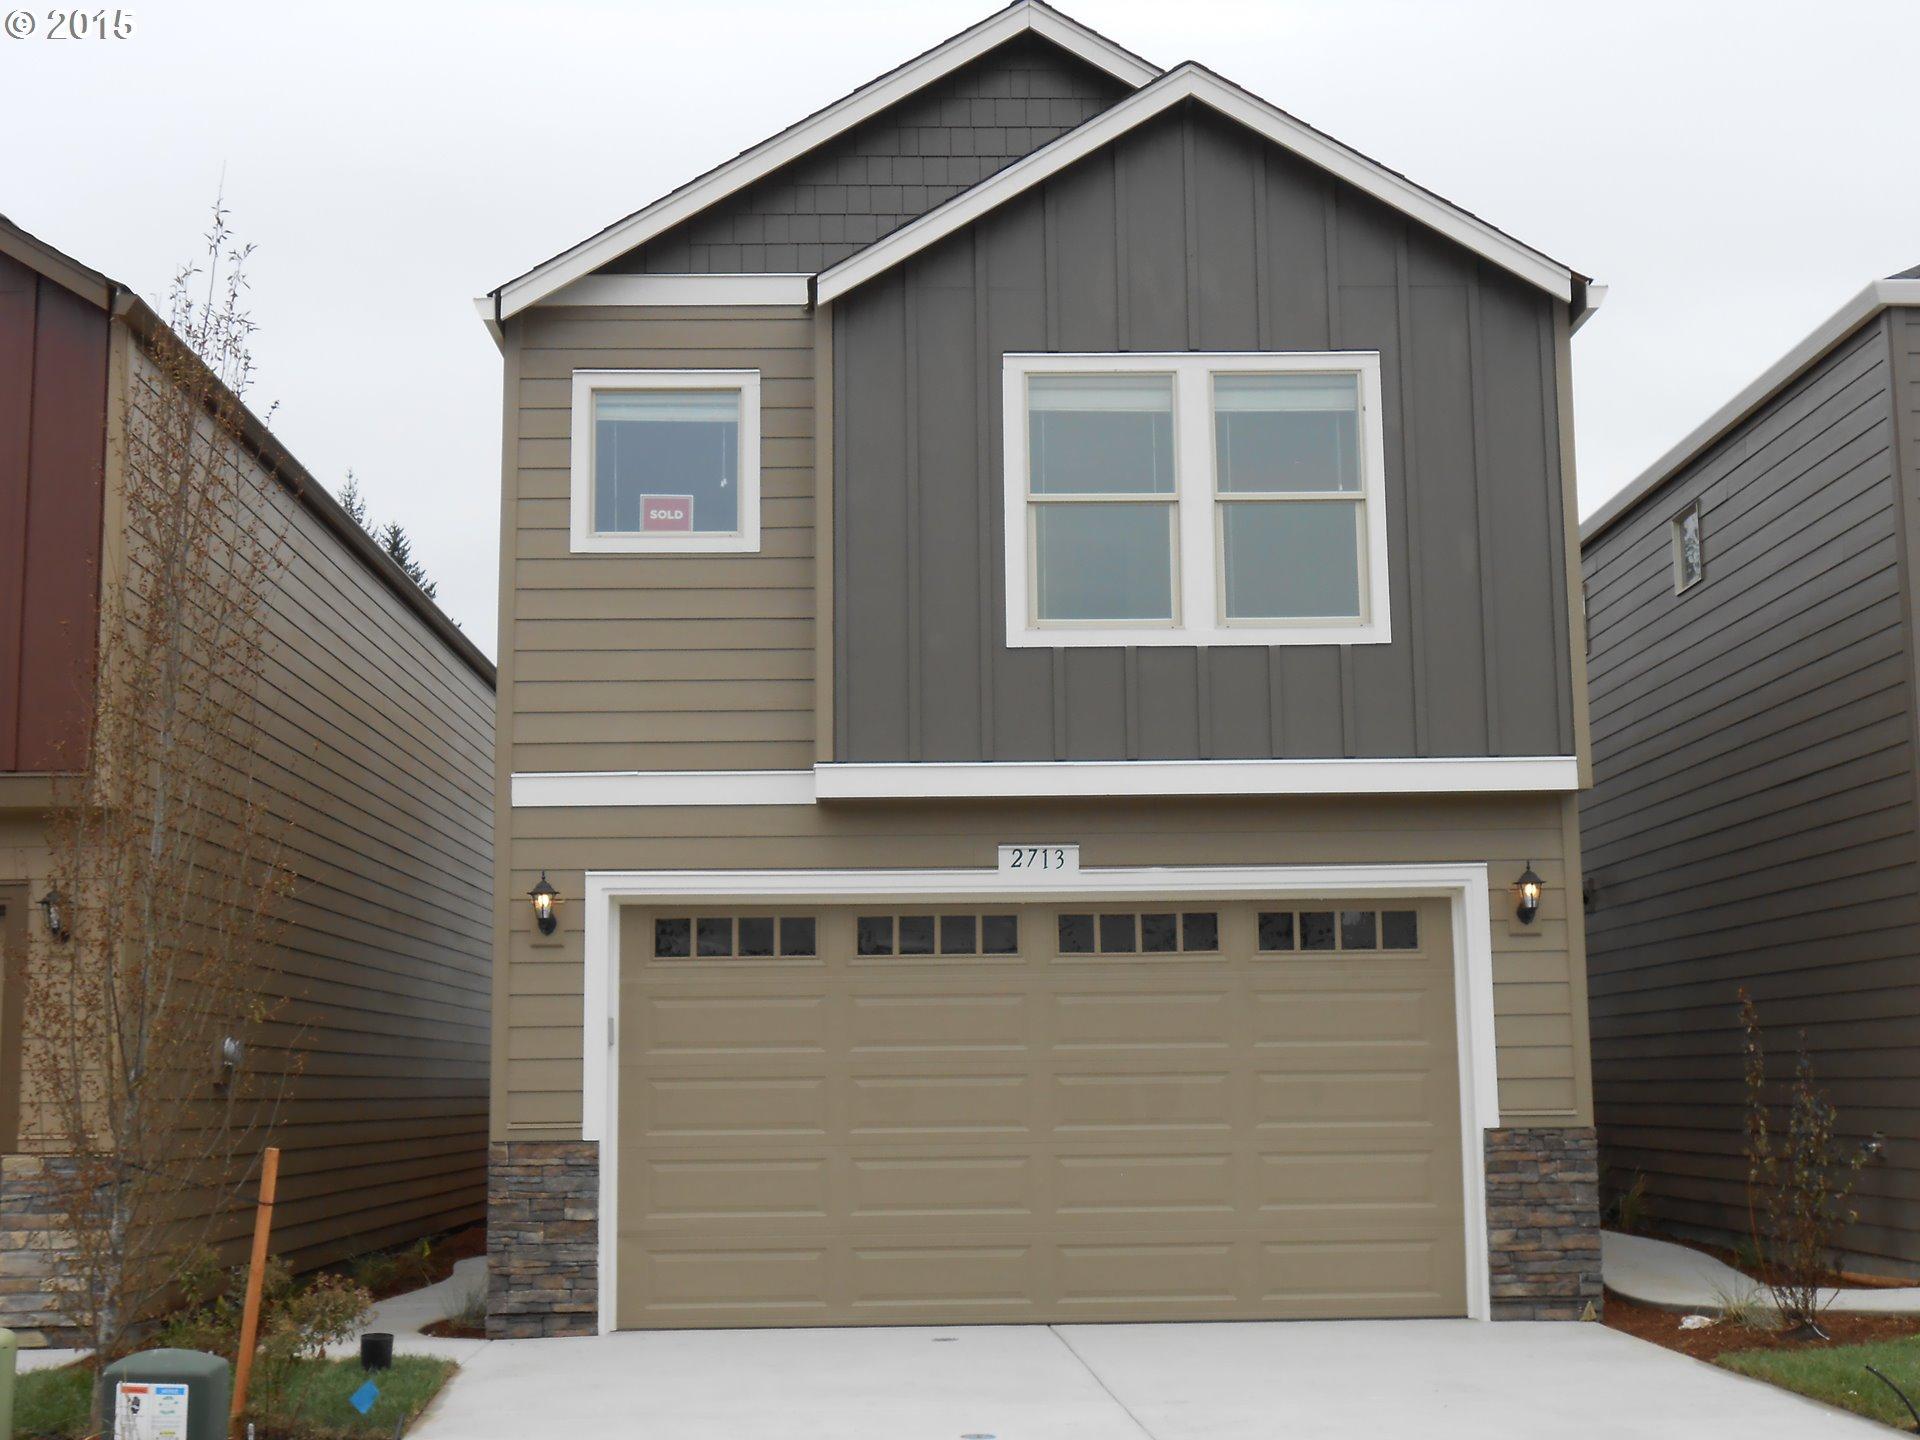 2640 NE 130th Ct, Vancouver, WA